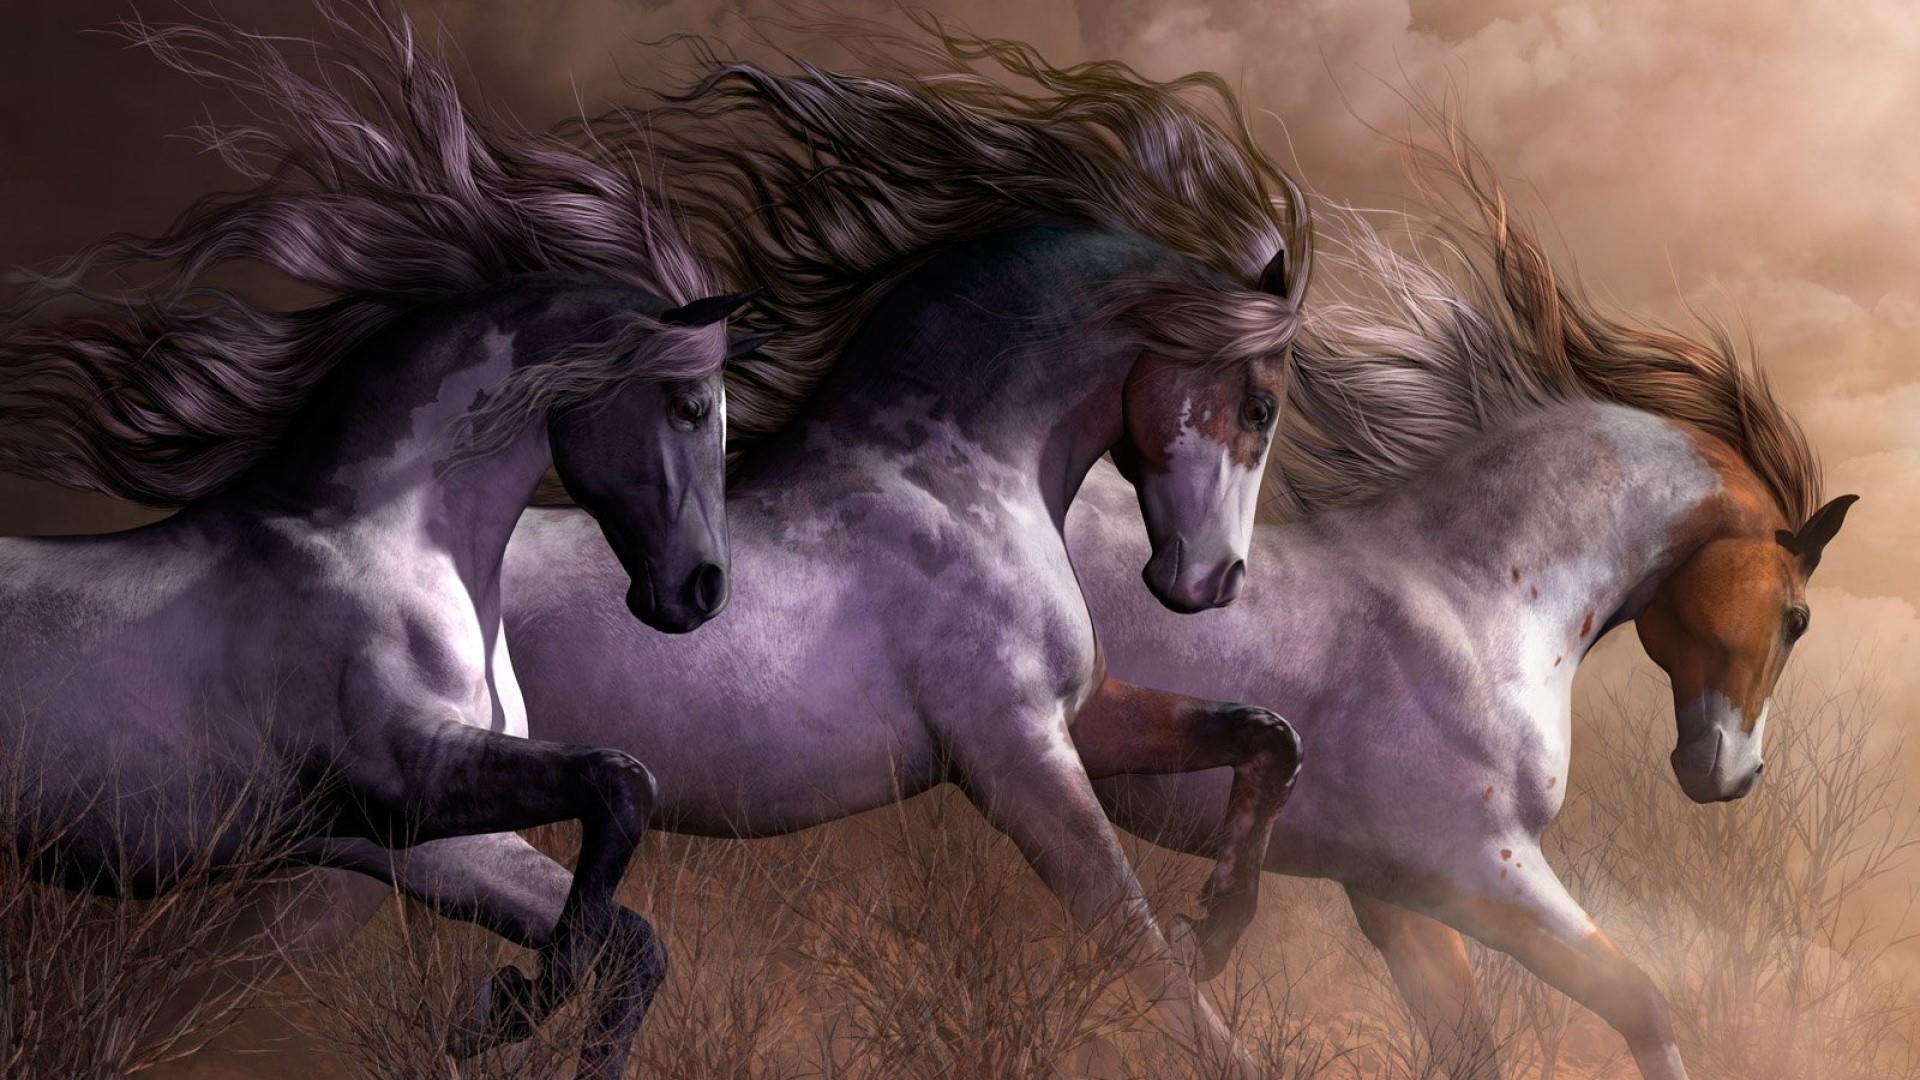 1920x1080 Galloping Wild Horses Wallpaper 3 Horses Running 1920x1080 Wallpaper Teahub Io